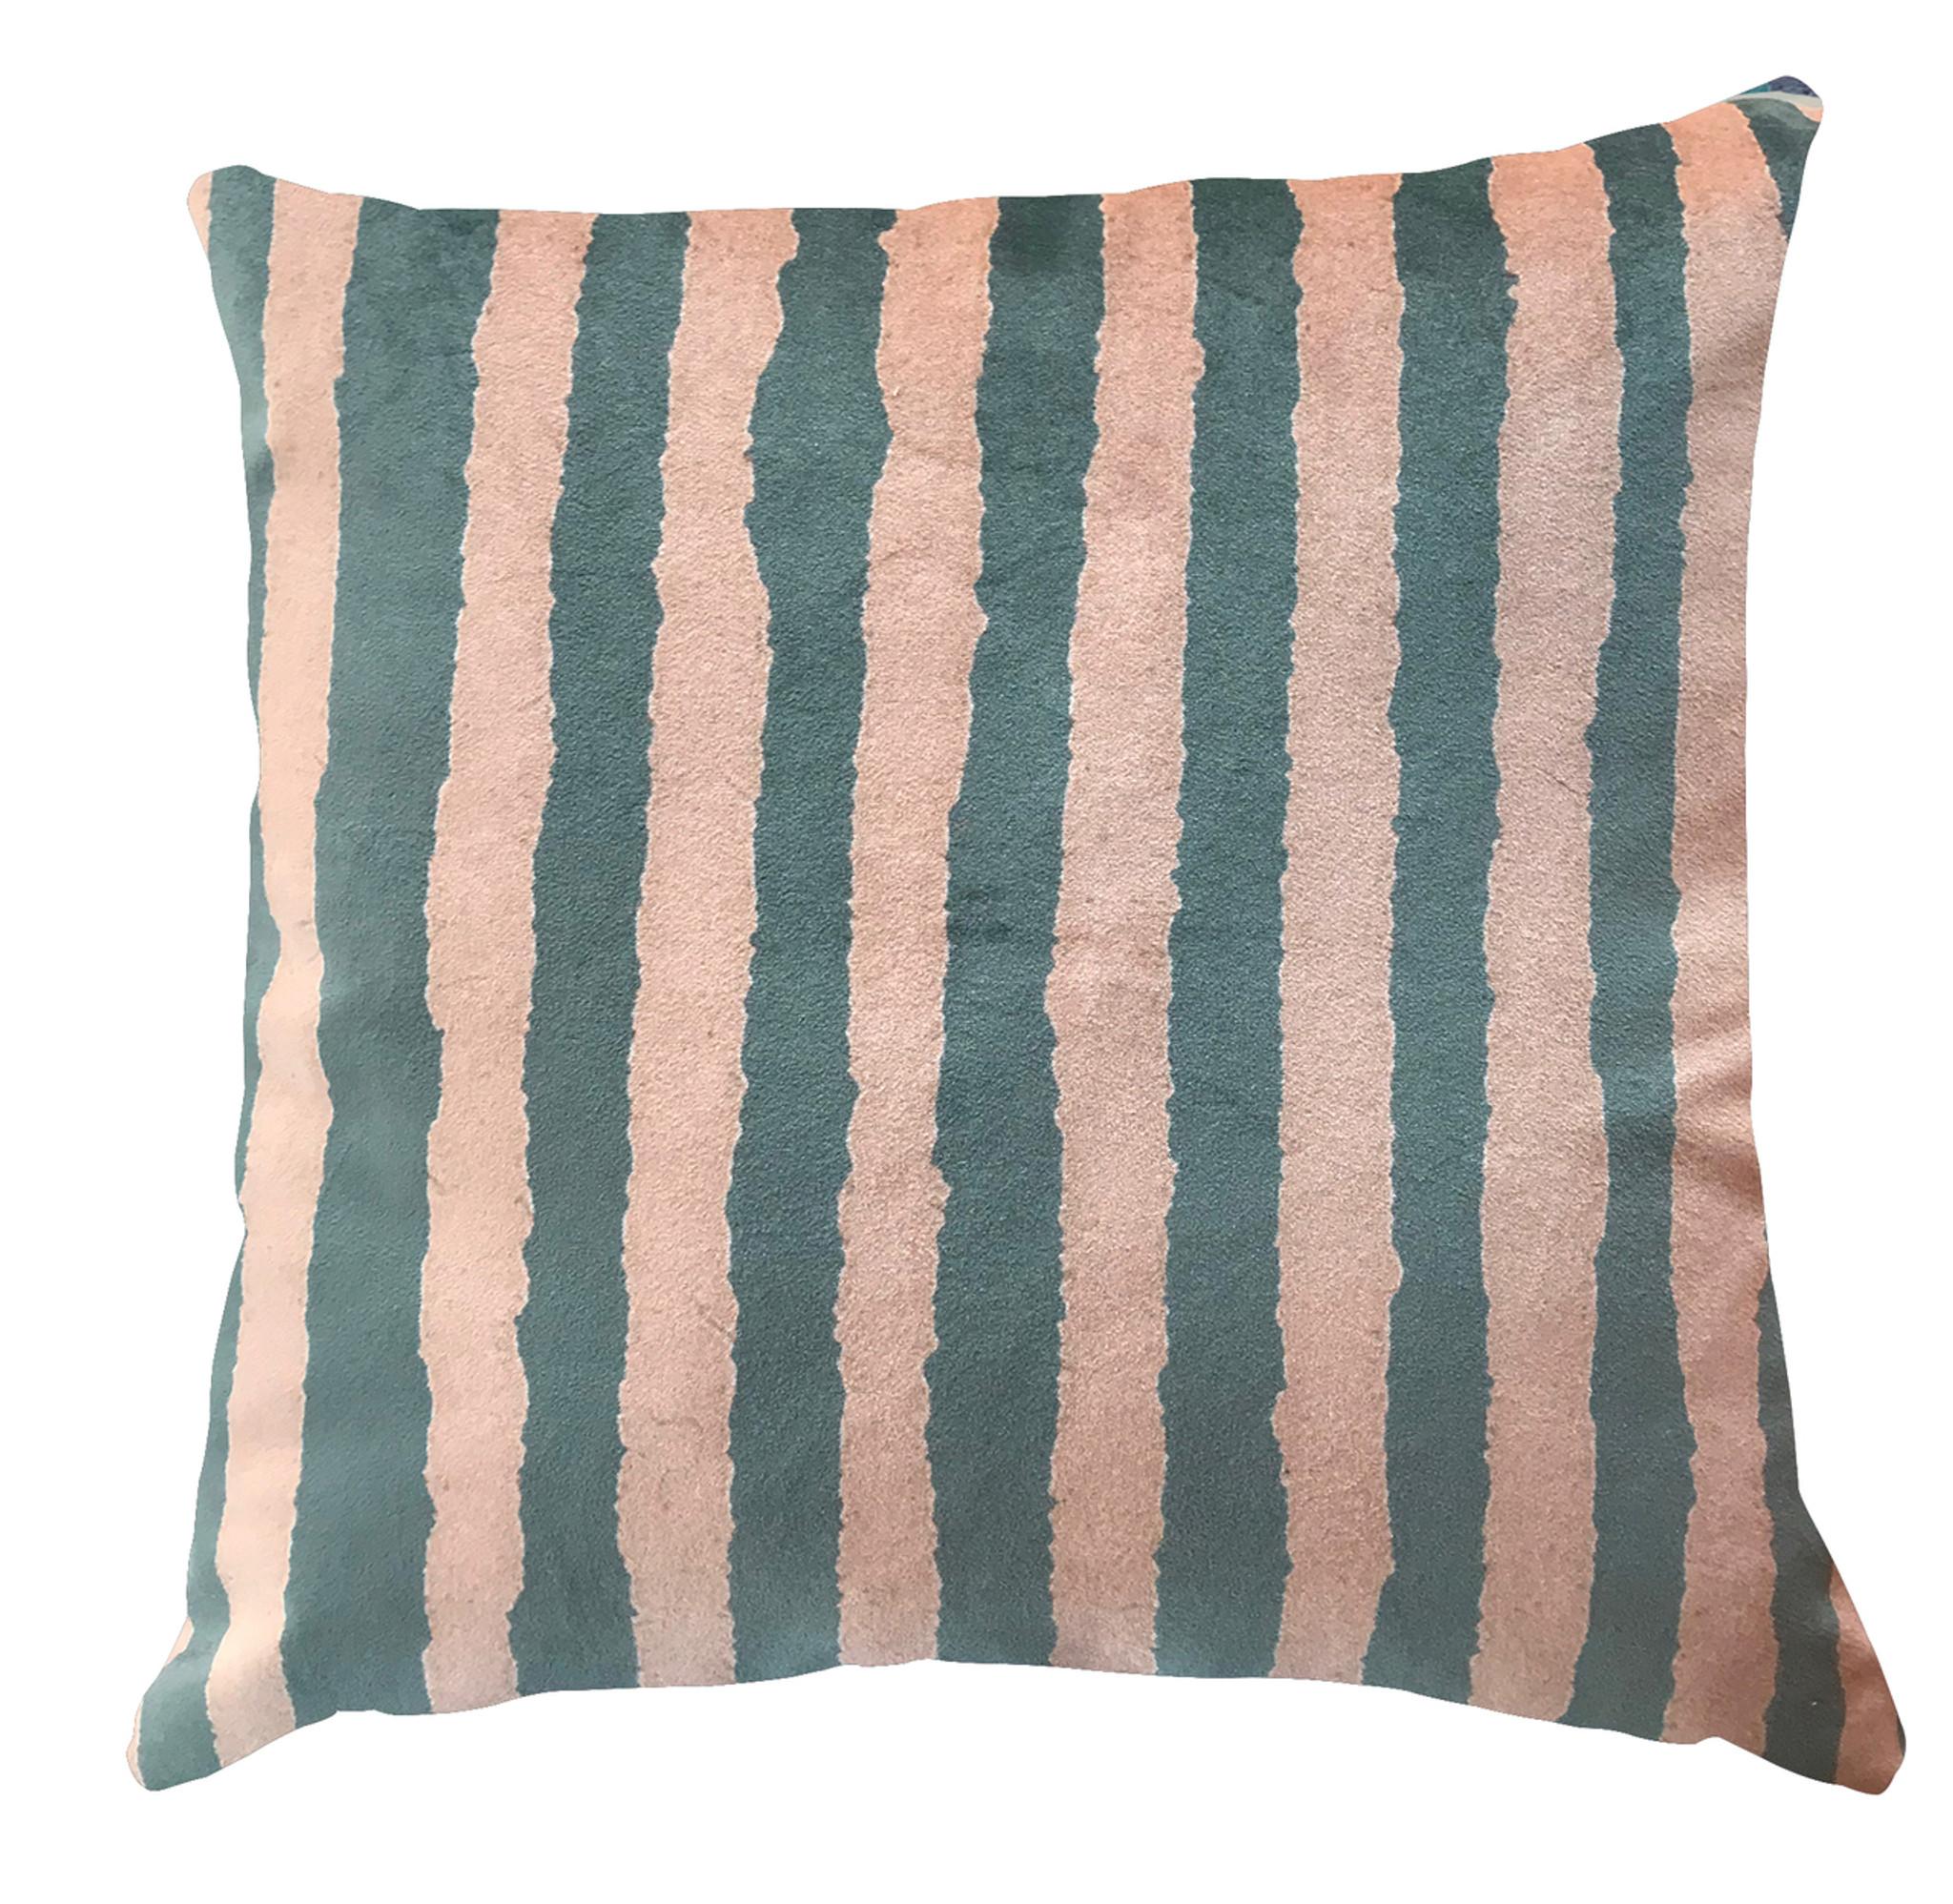 Cushion - Modigliani Was Here - Pumpkin Stripe